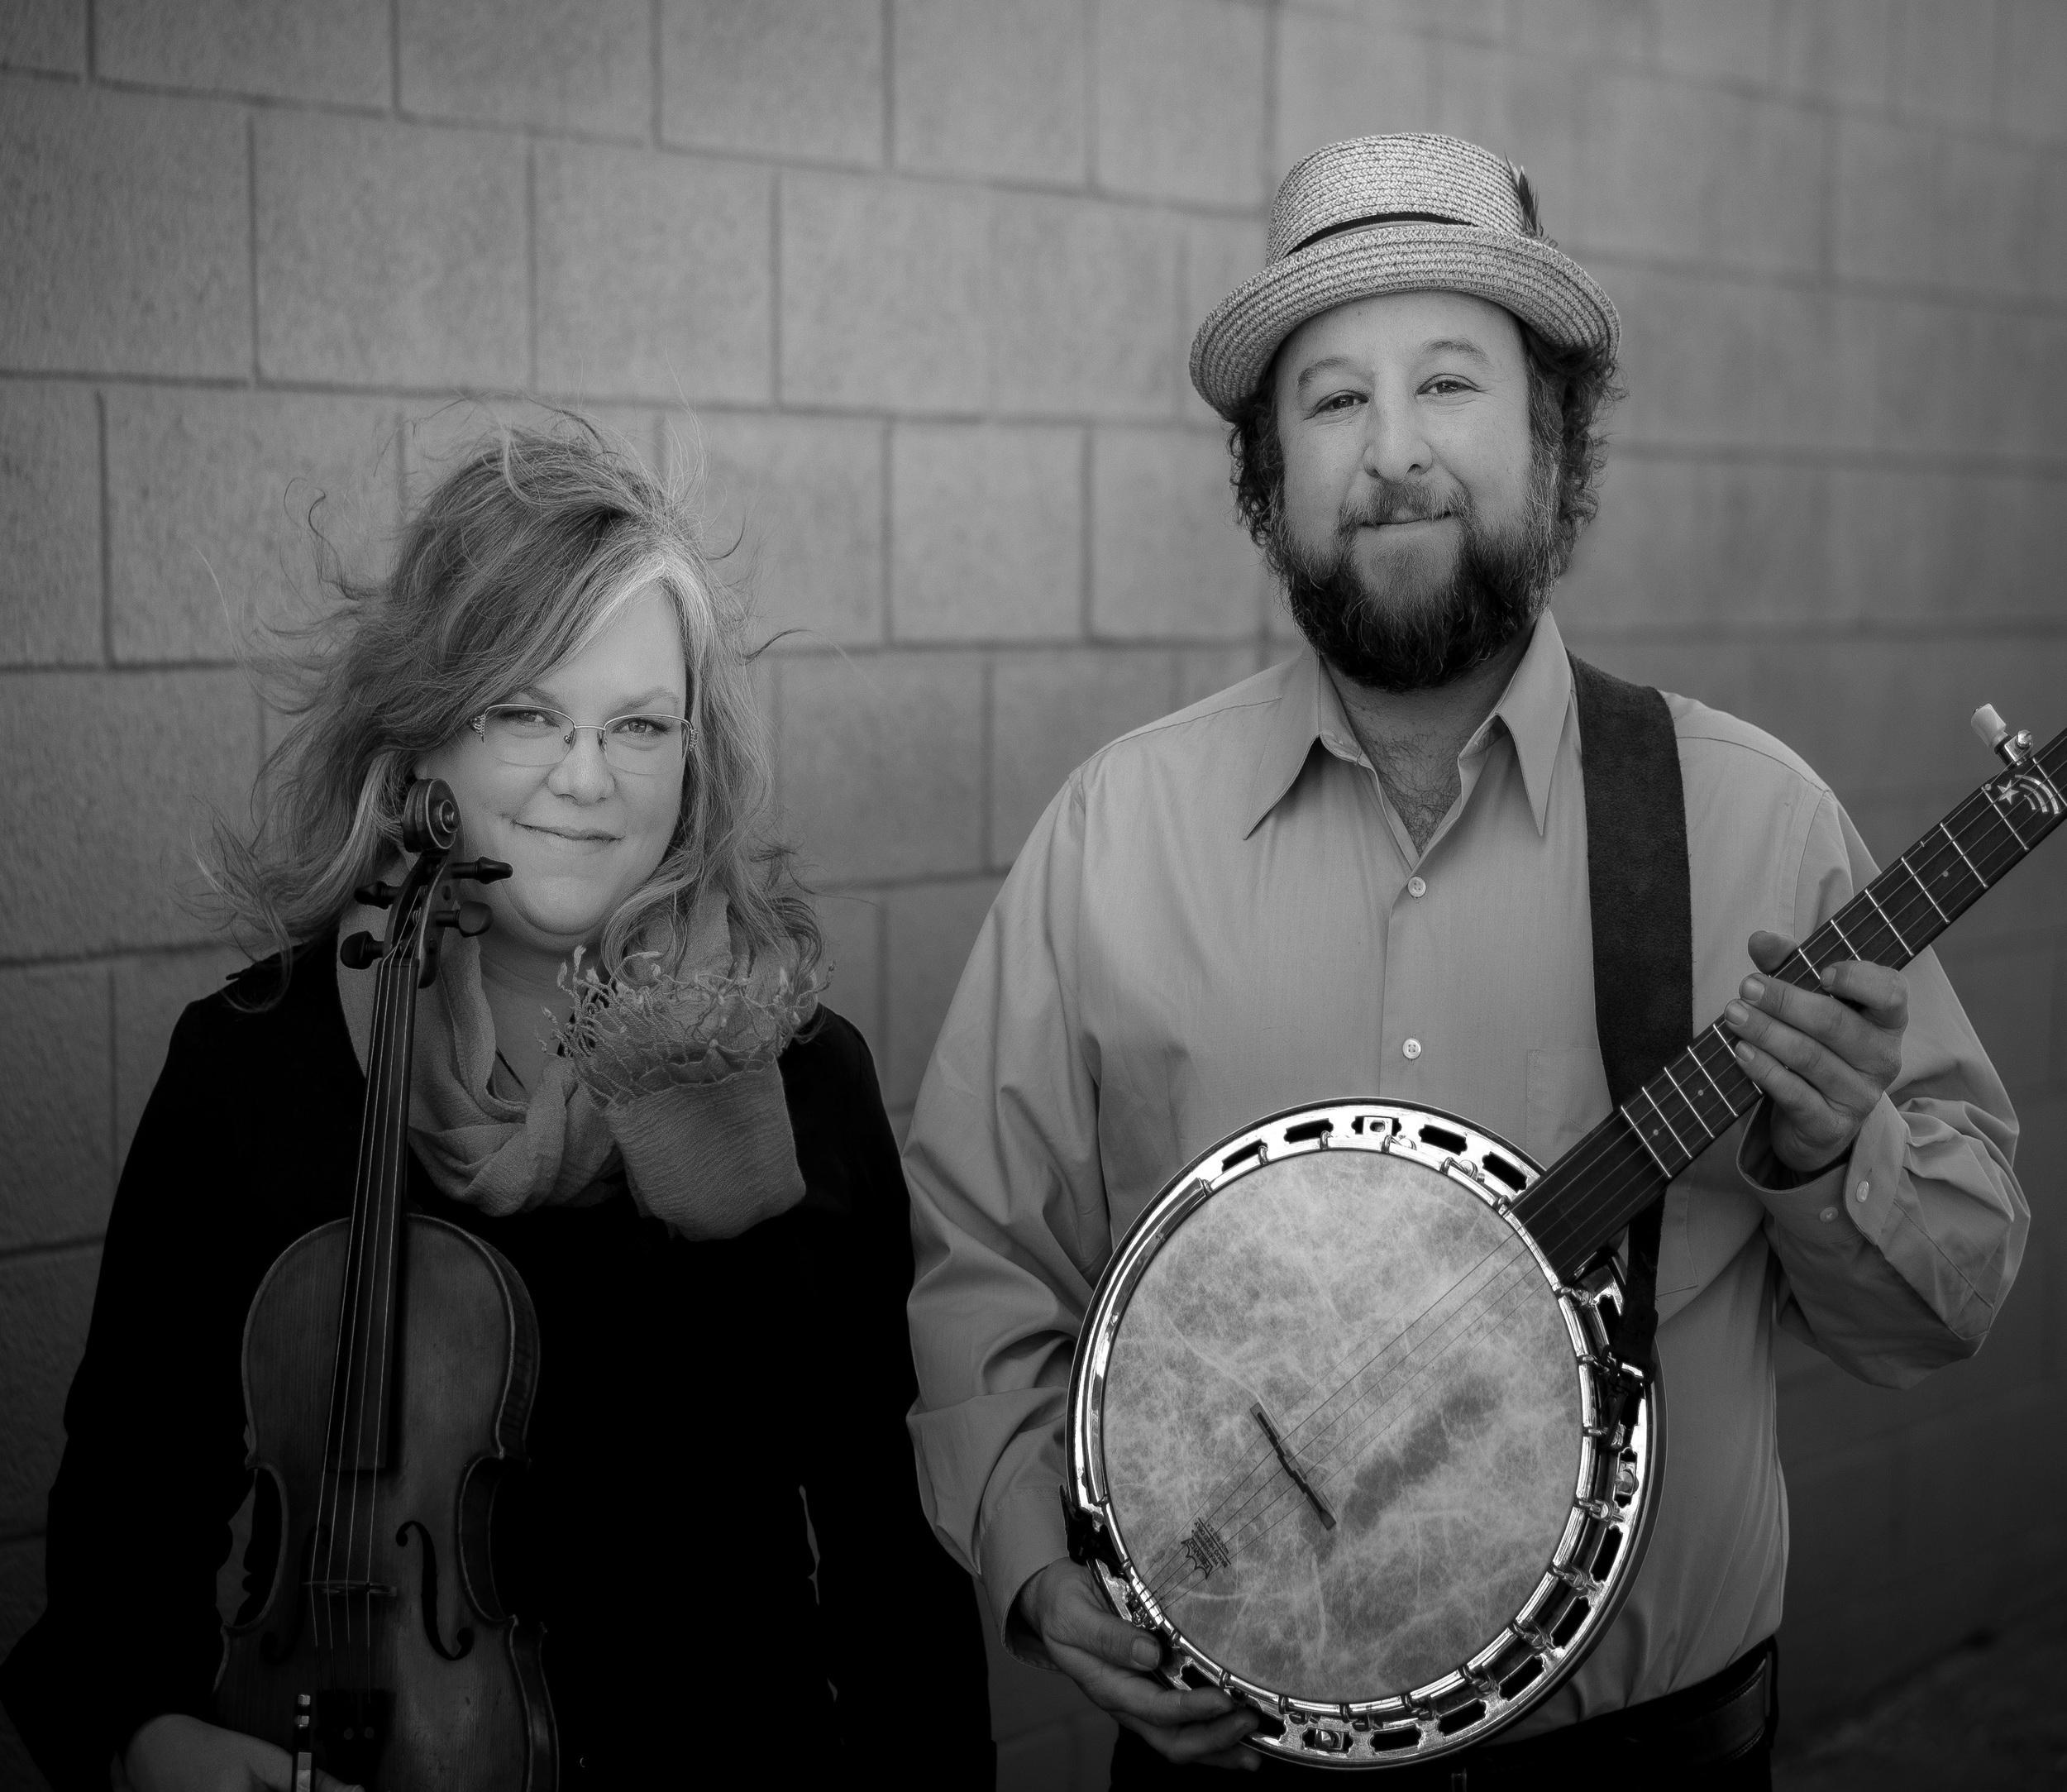 Betse & Clarke with instruments promotional photograph, B/W. Photo credit: Clarke Wyatt